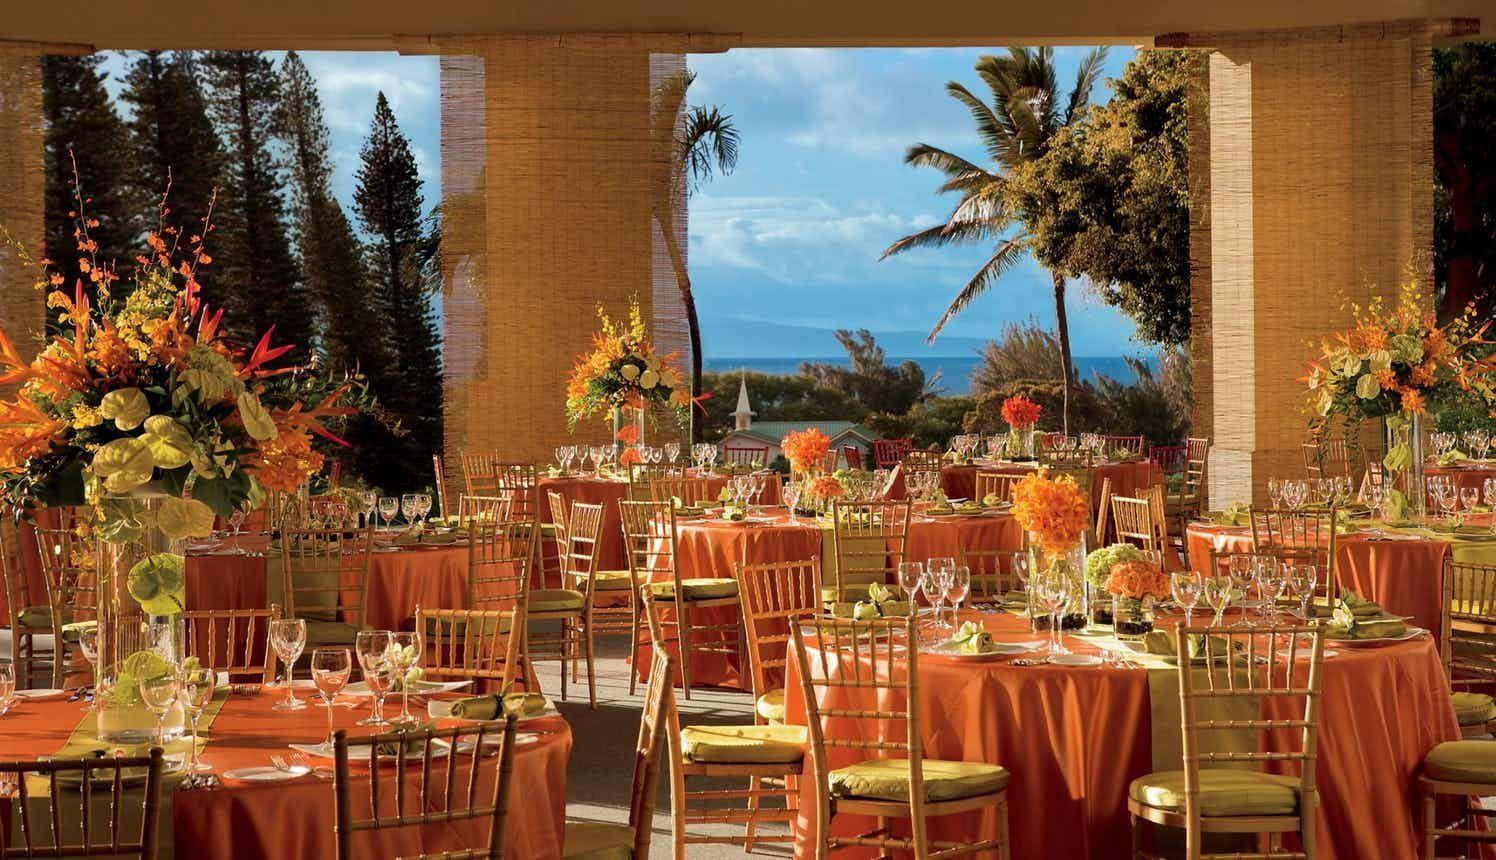 The Ritz-Carlton, Kapalua - Kapalua, Maui, Hawaii #4 ...